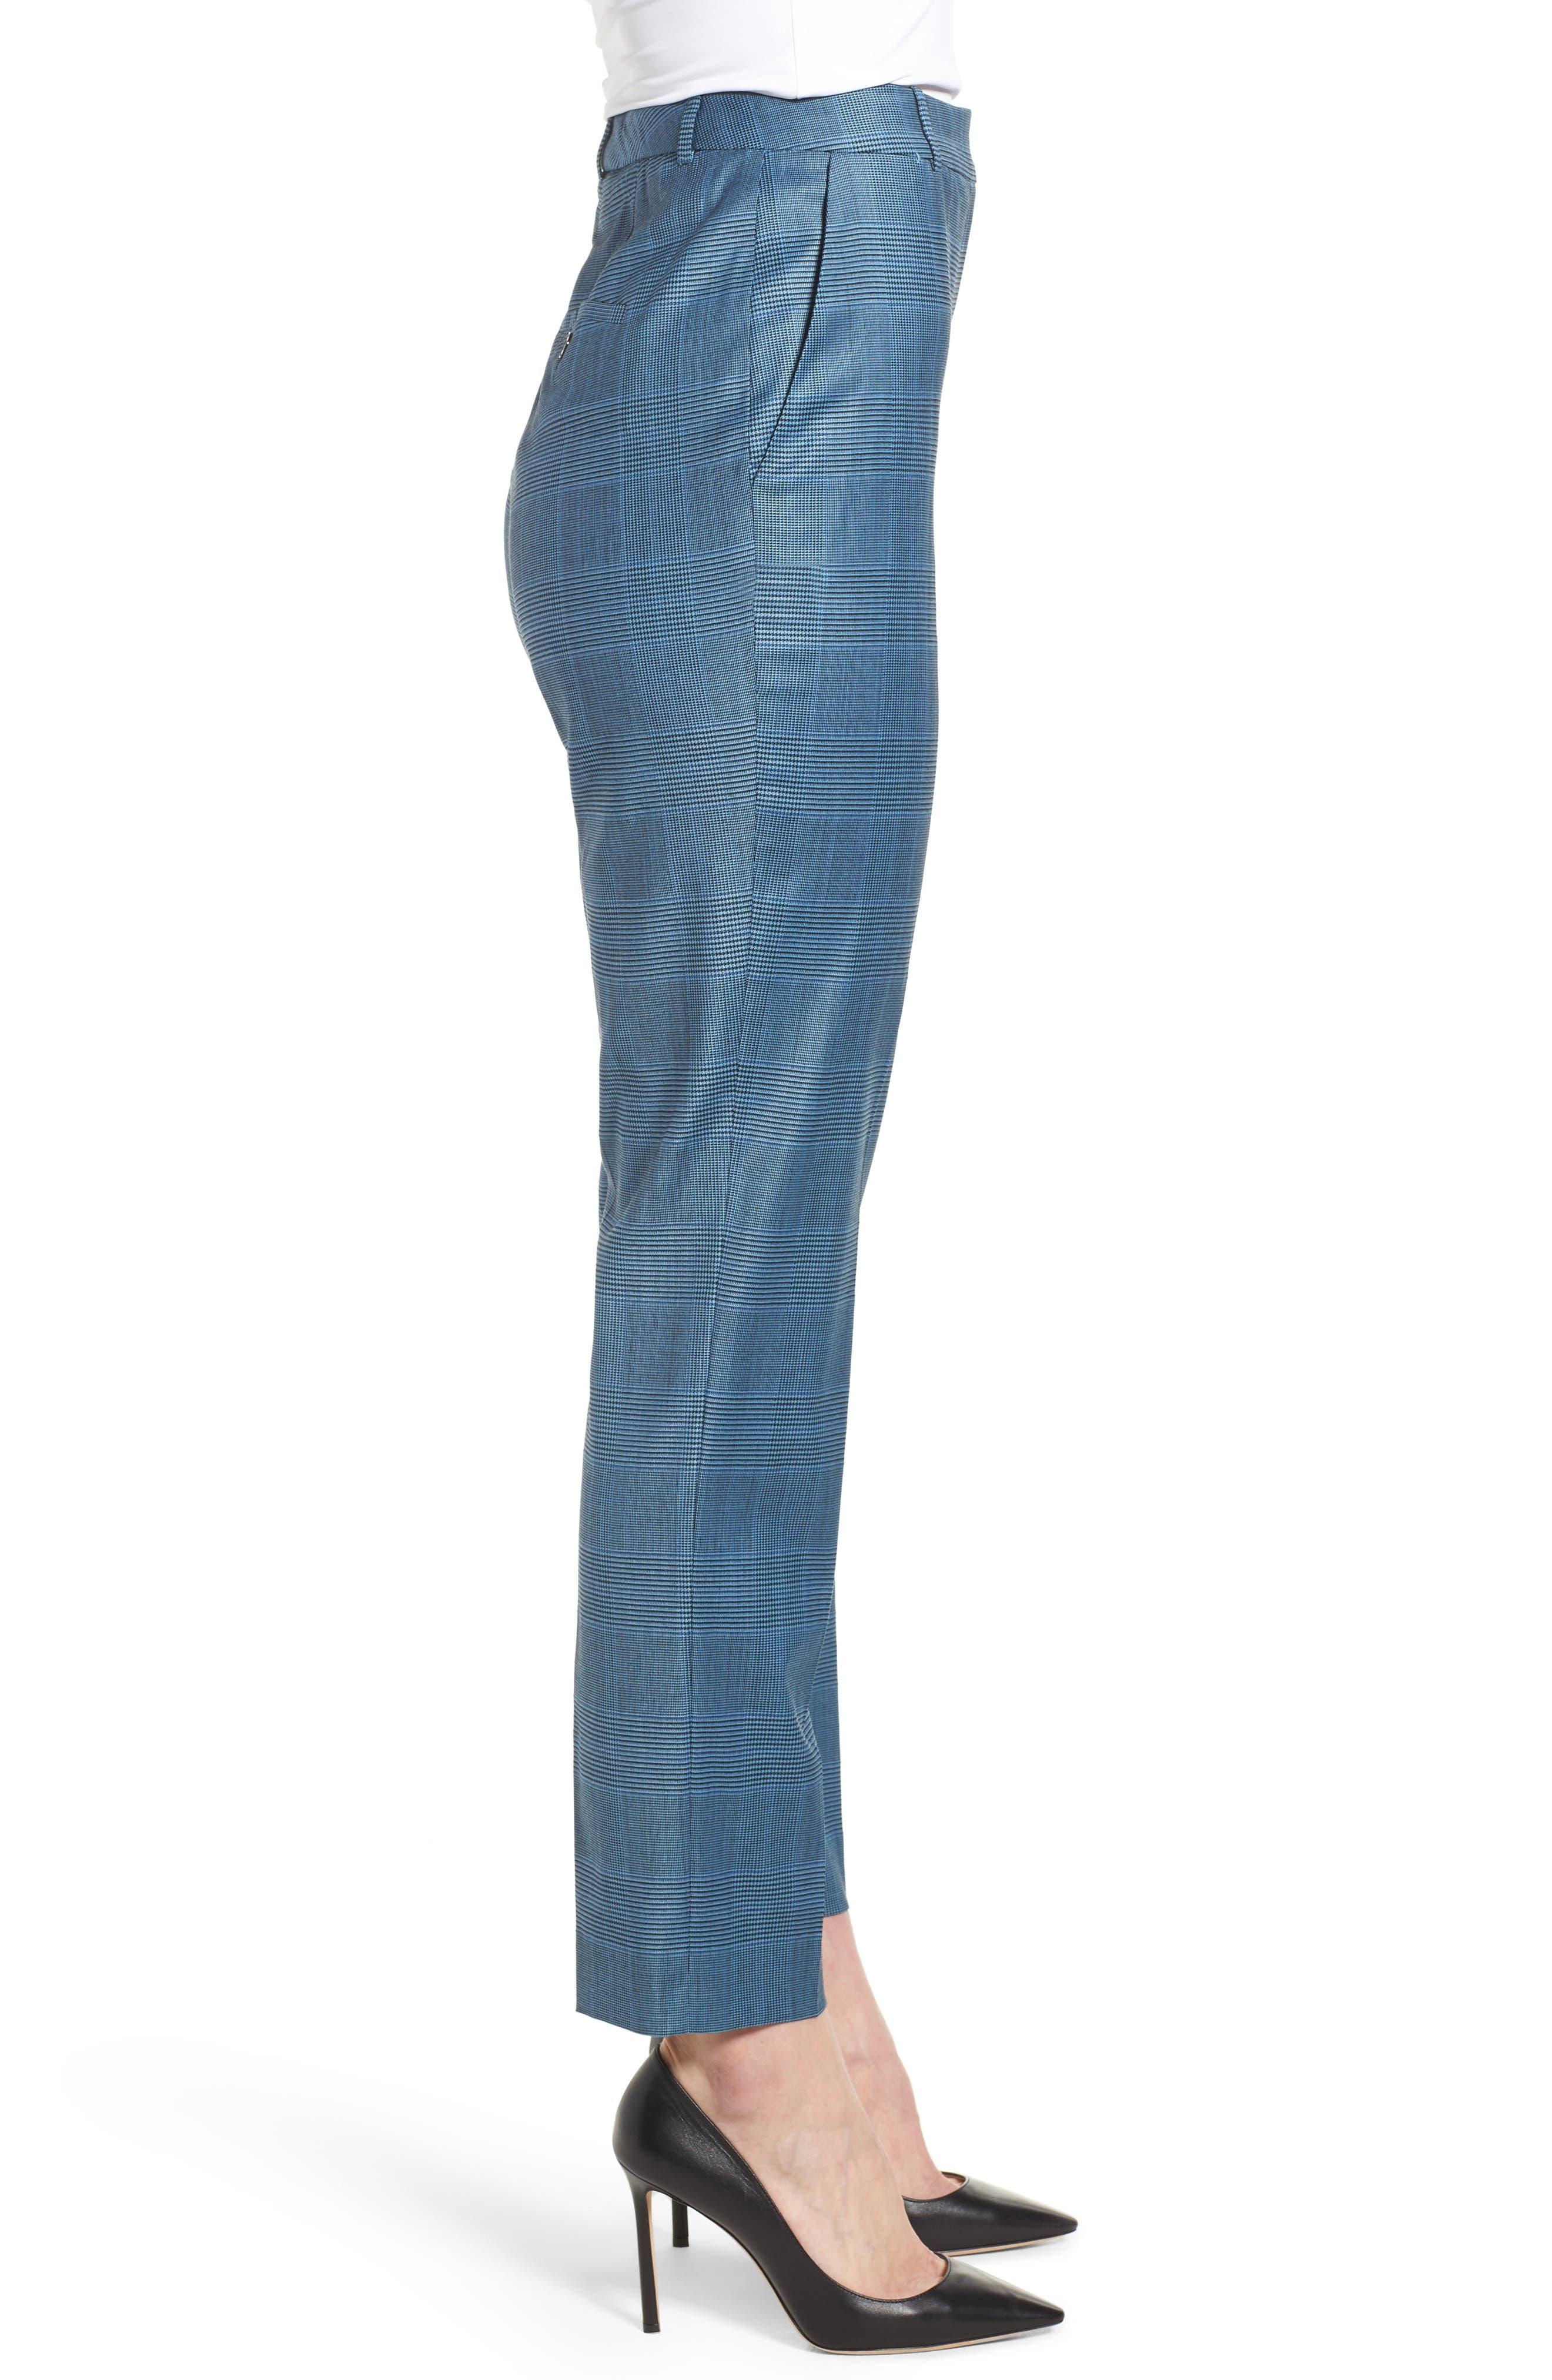 Tofilia Glencheck Slim Fit Trousers,                             Alternate thumbnail 3, color,                             Sailor Blue Fantasy